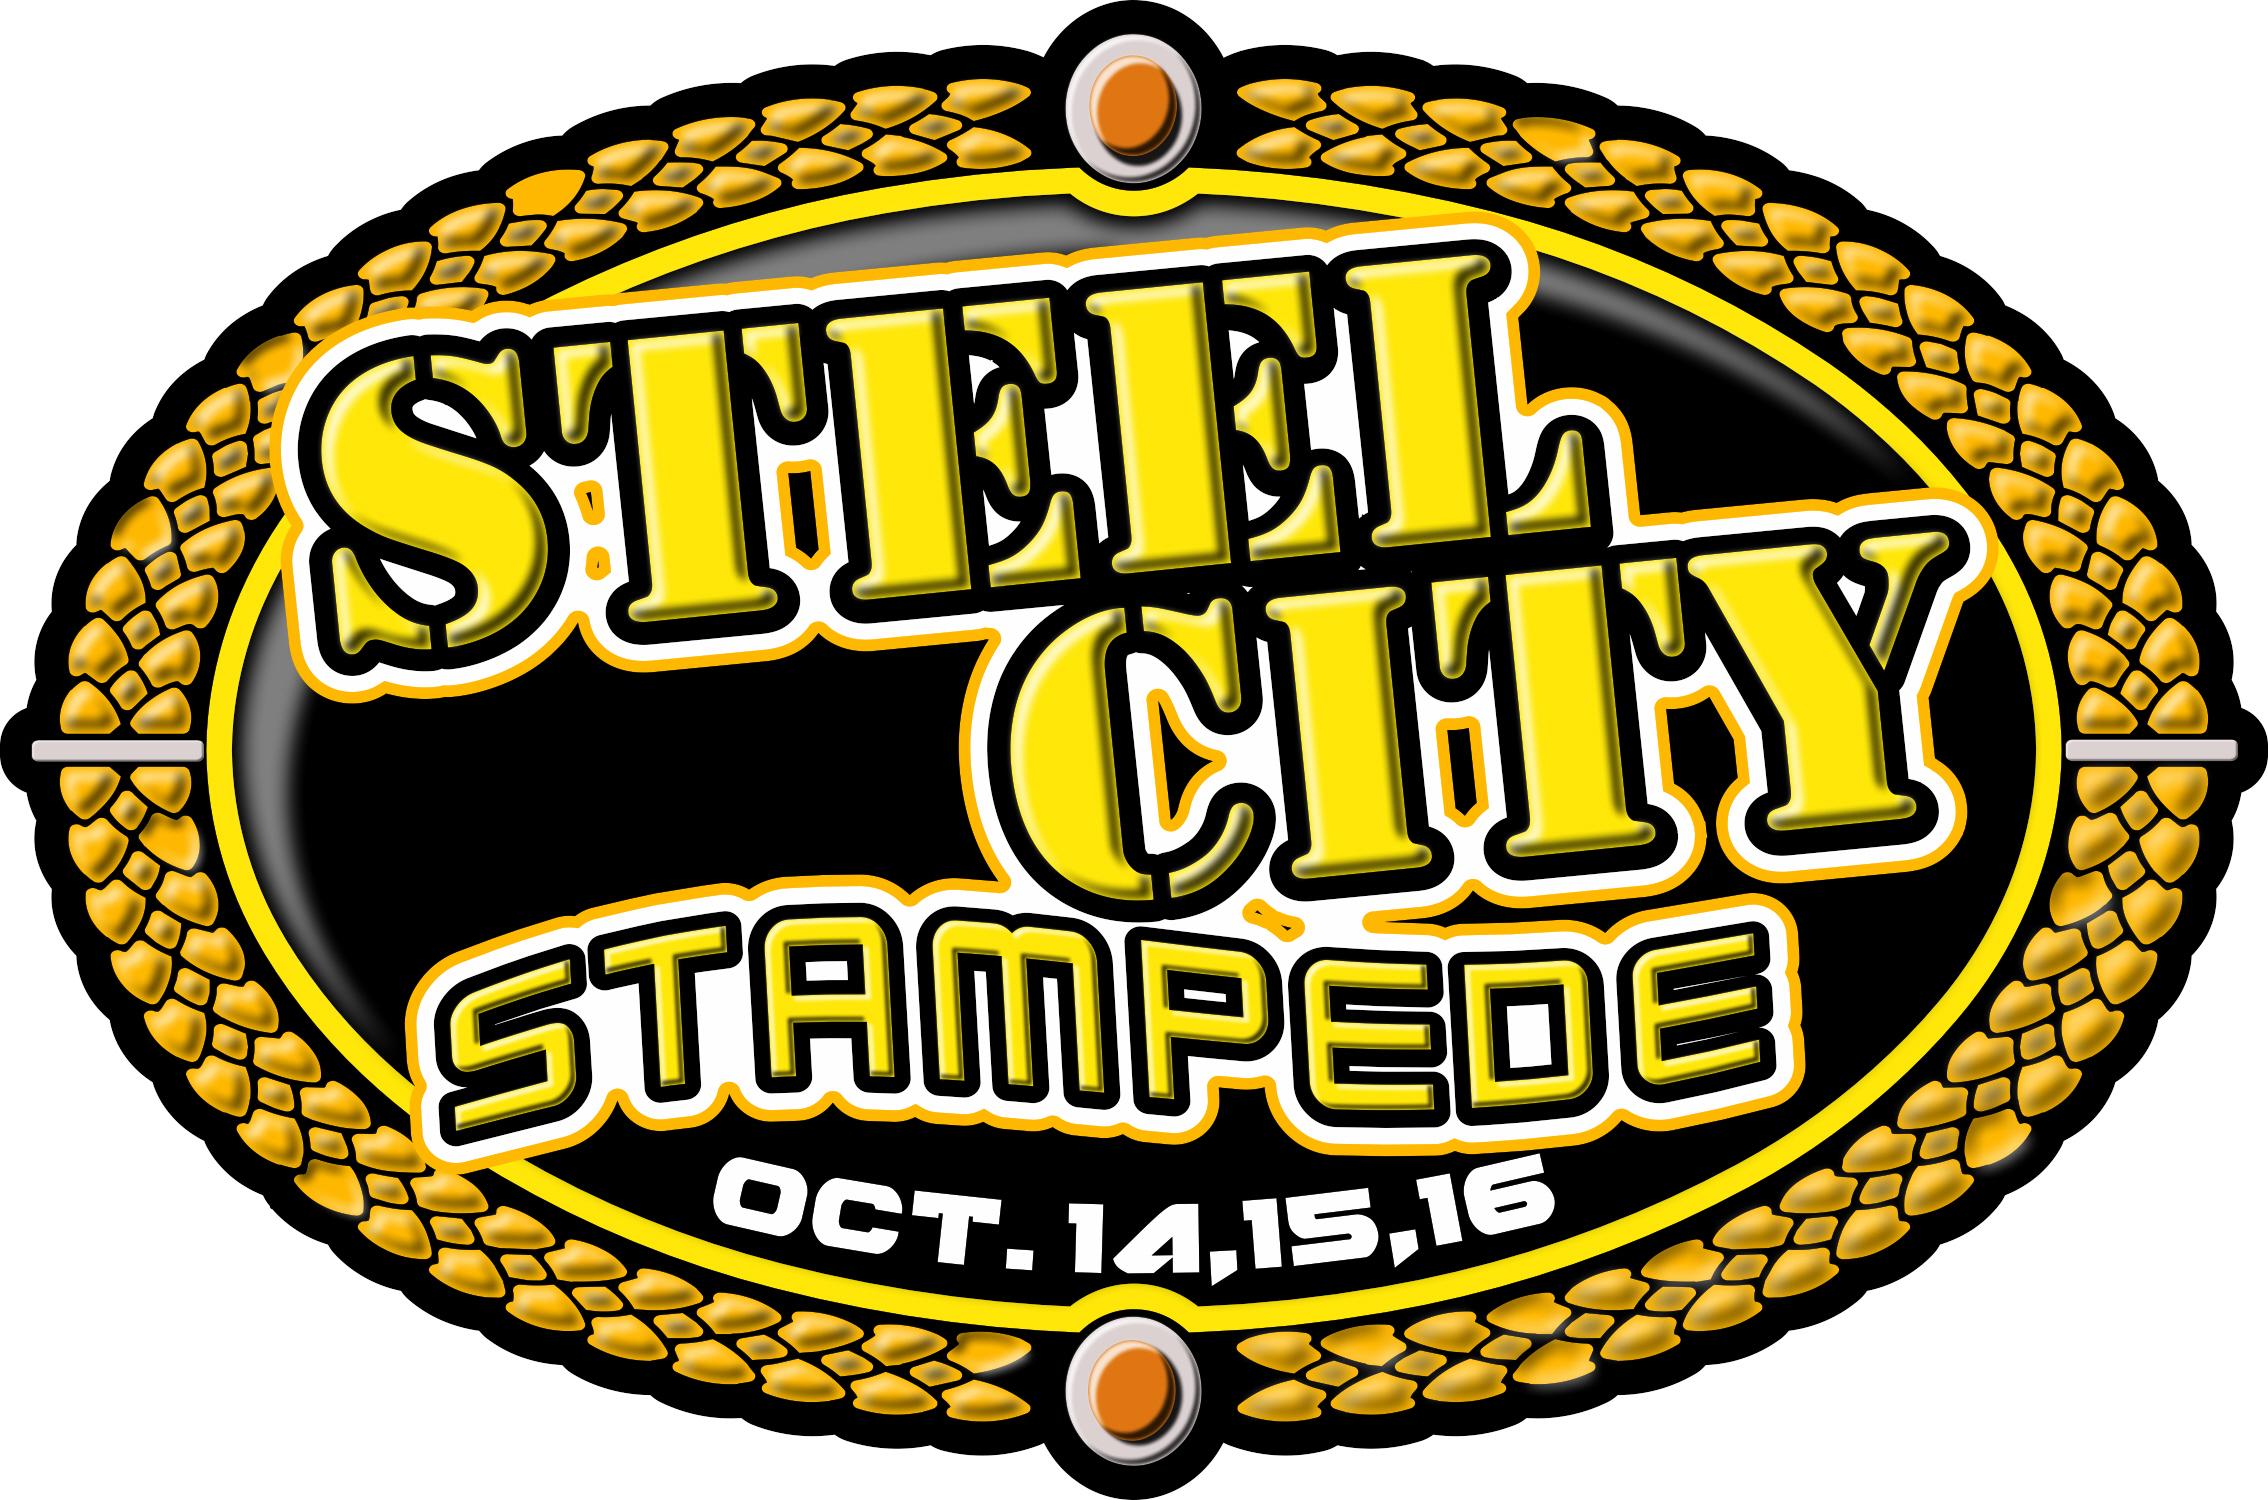 Steel City Stampede